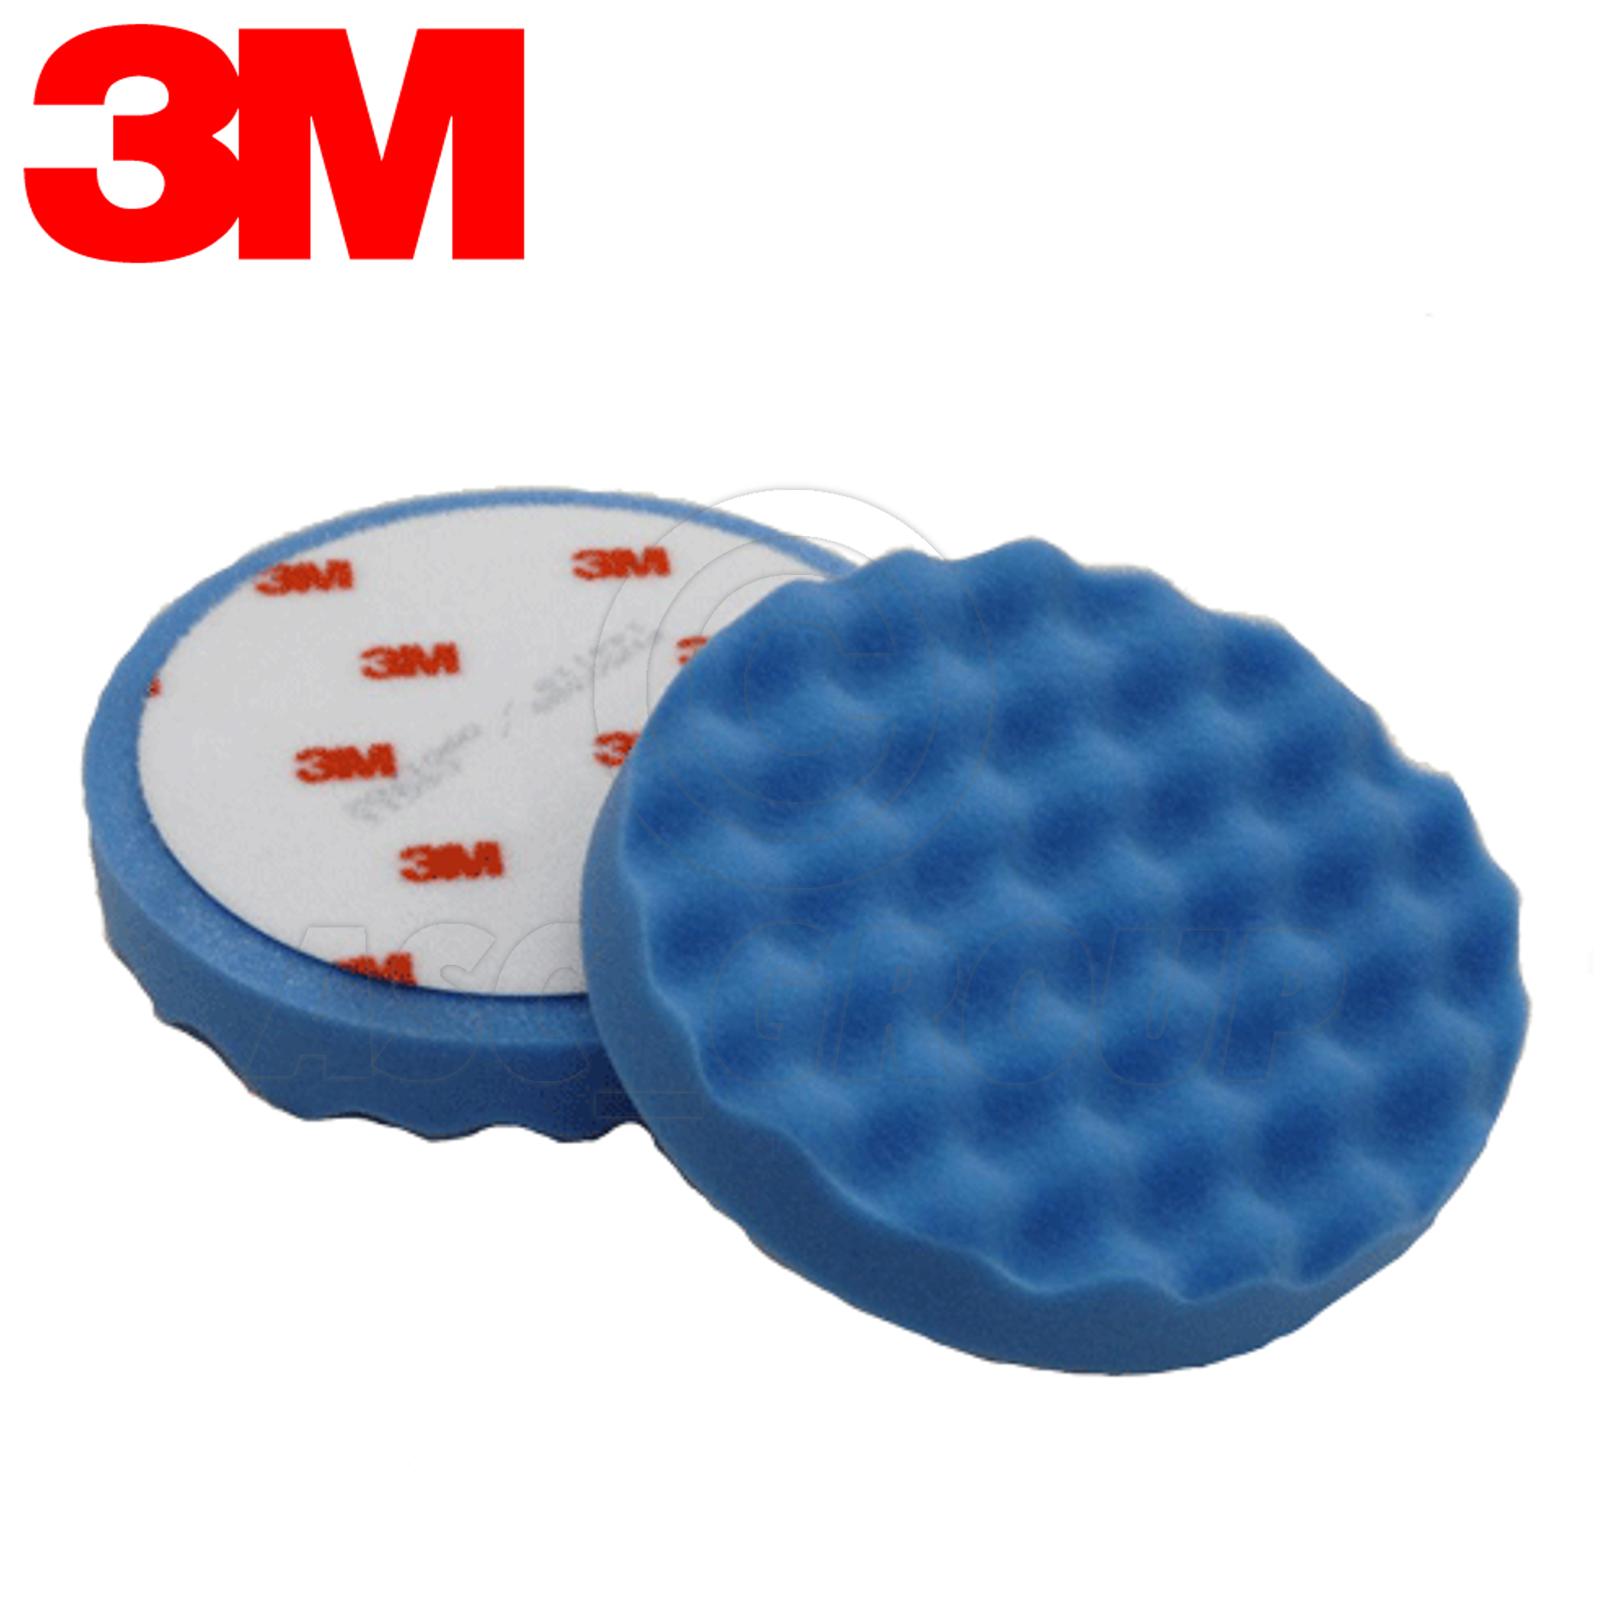 3M™ Perfect-It™ III High Gloss Pad